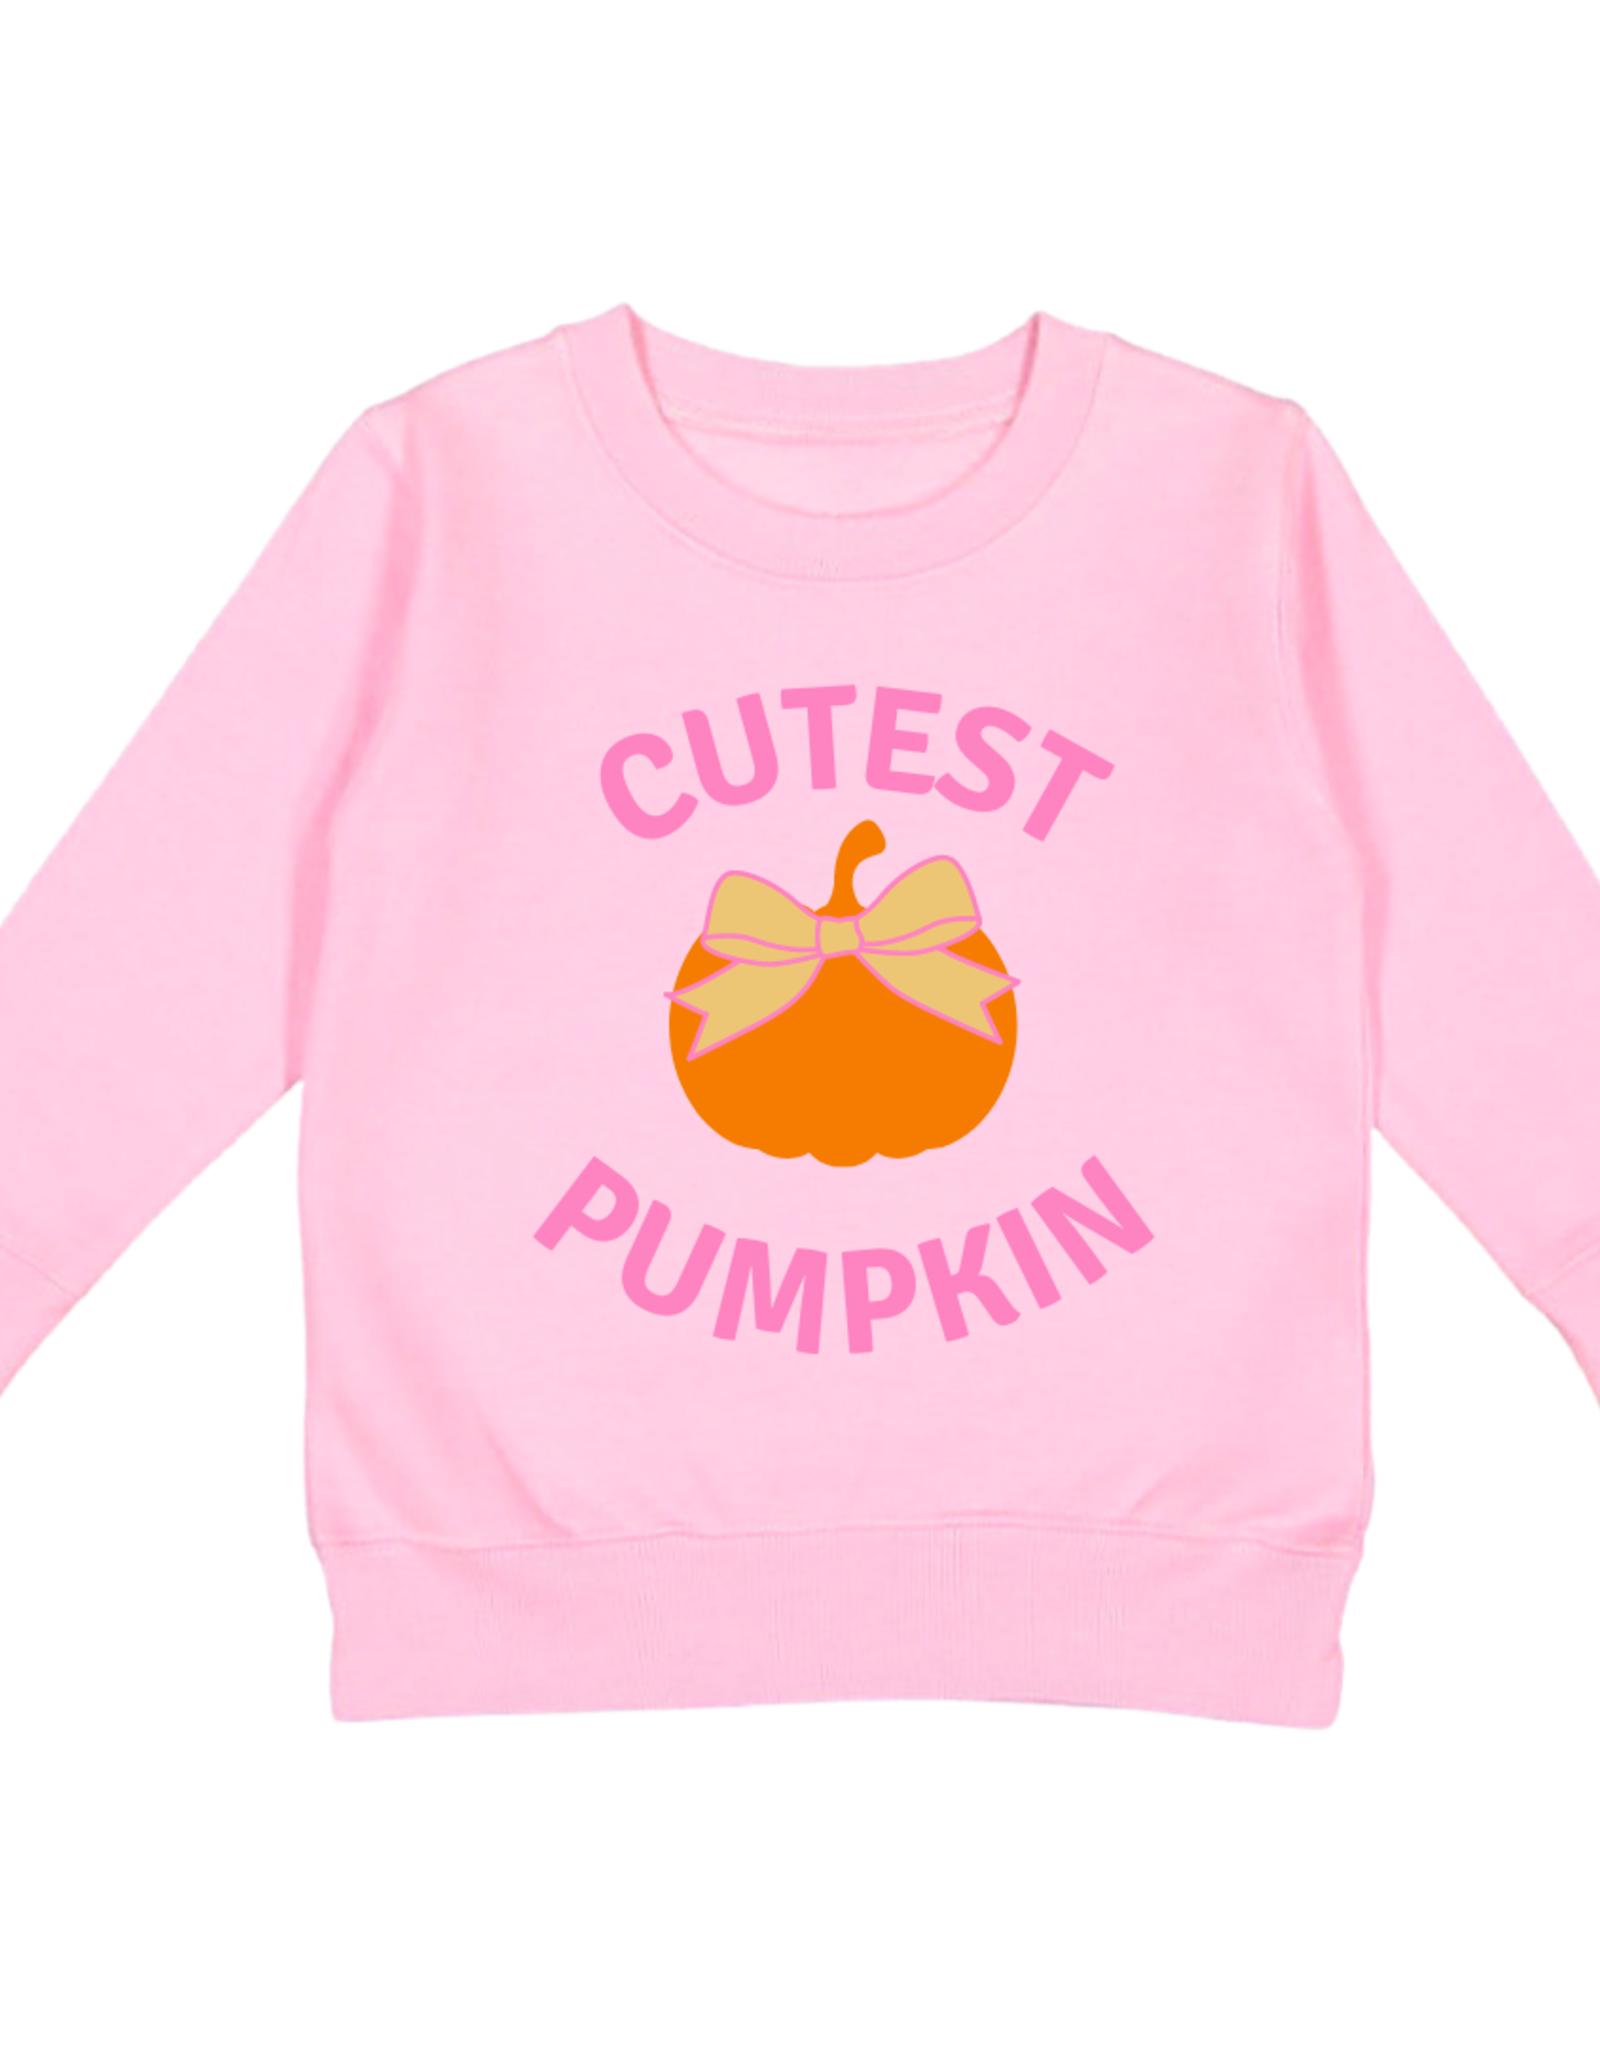 Cutest Pumpkin Sweatshirt